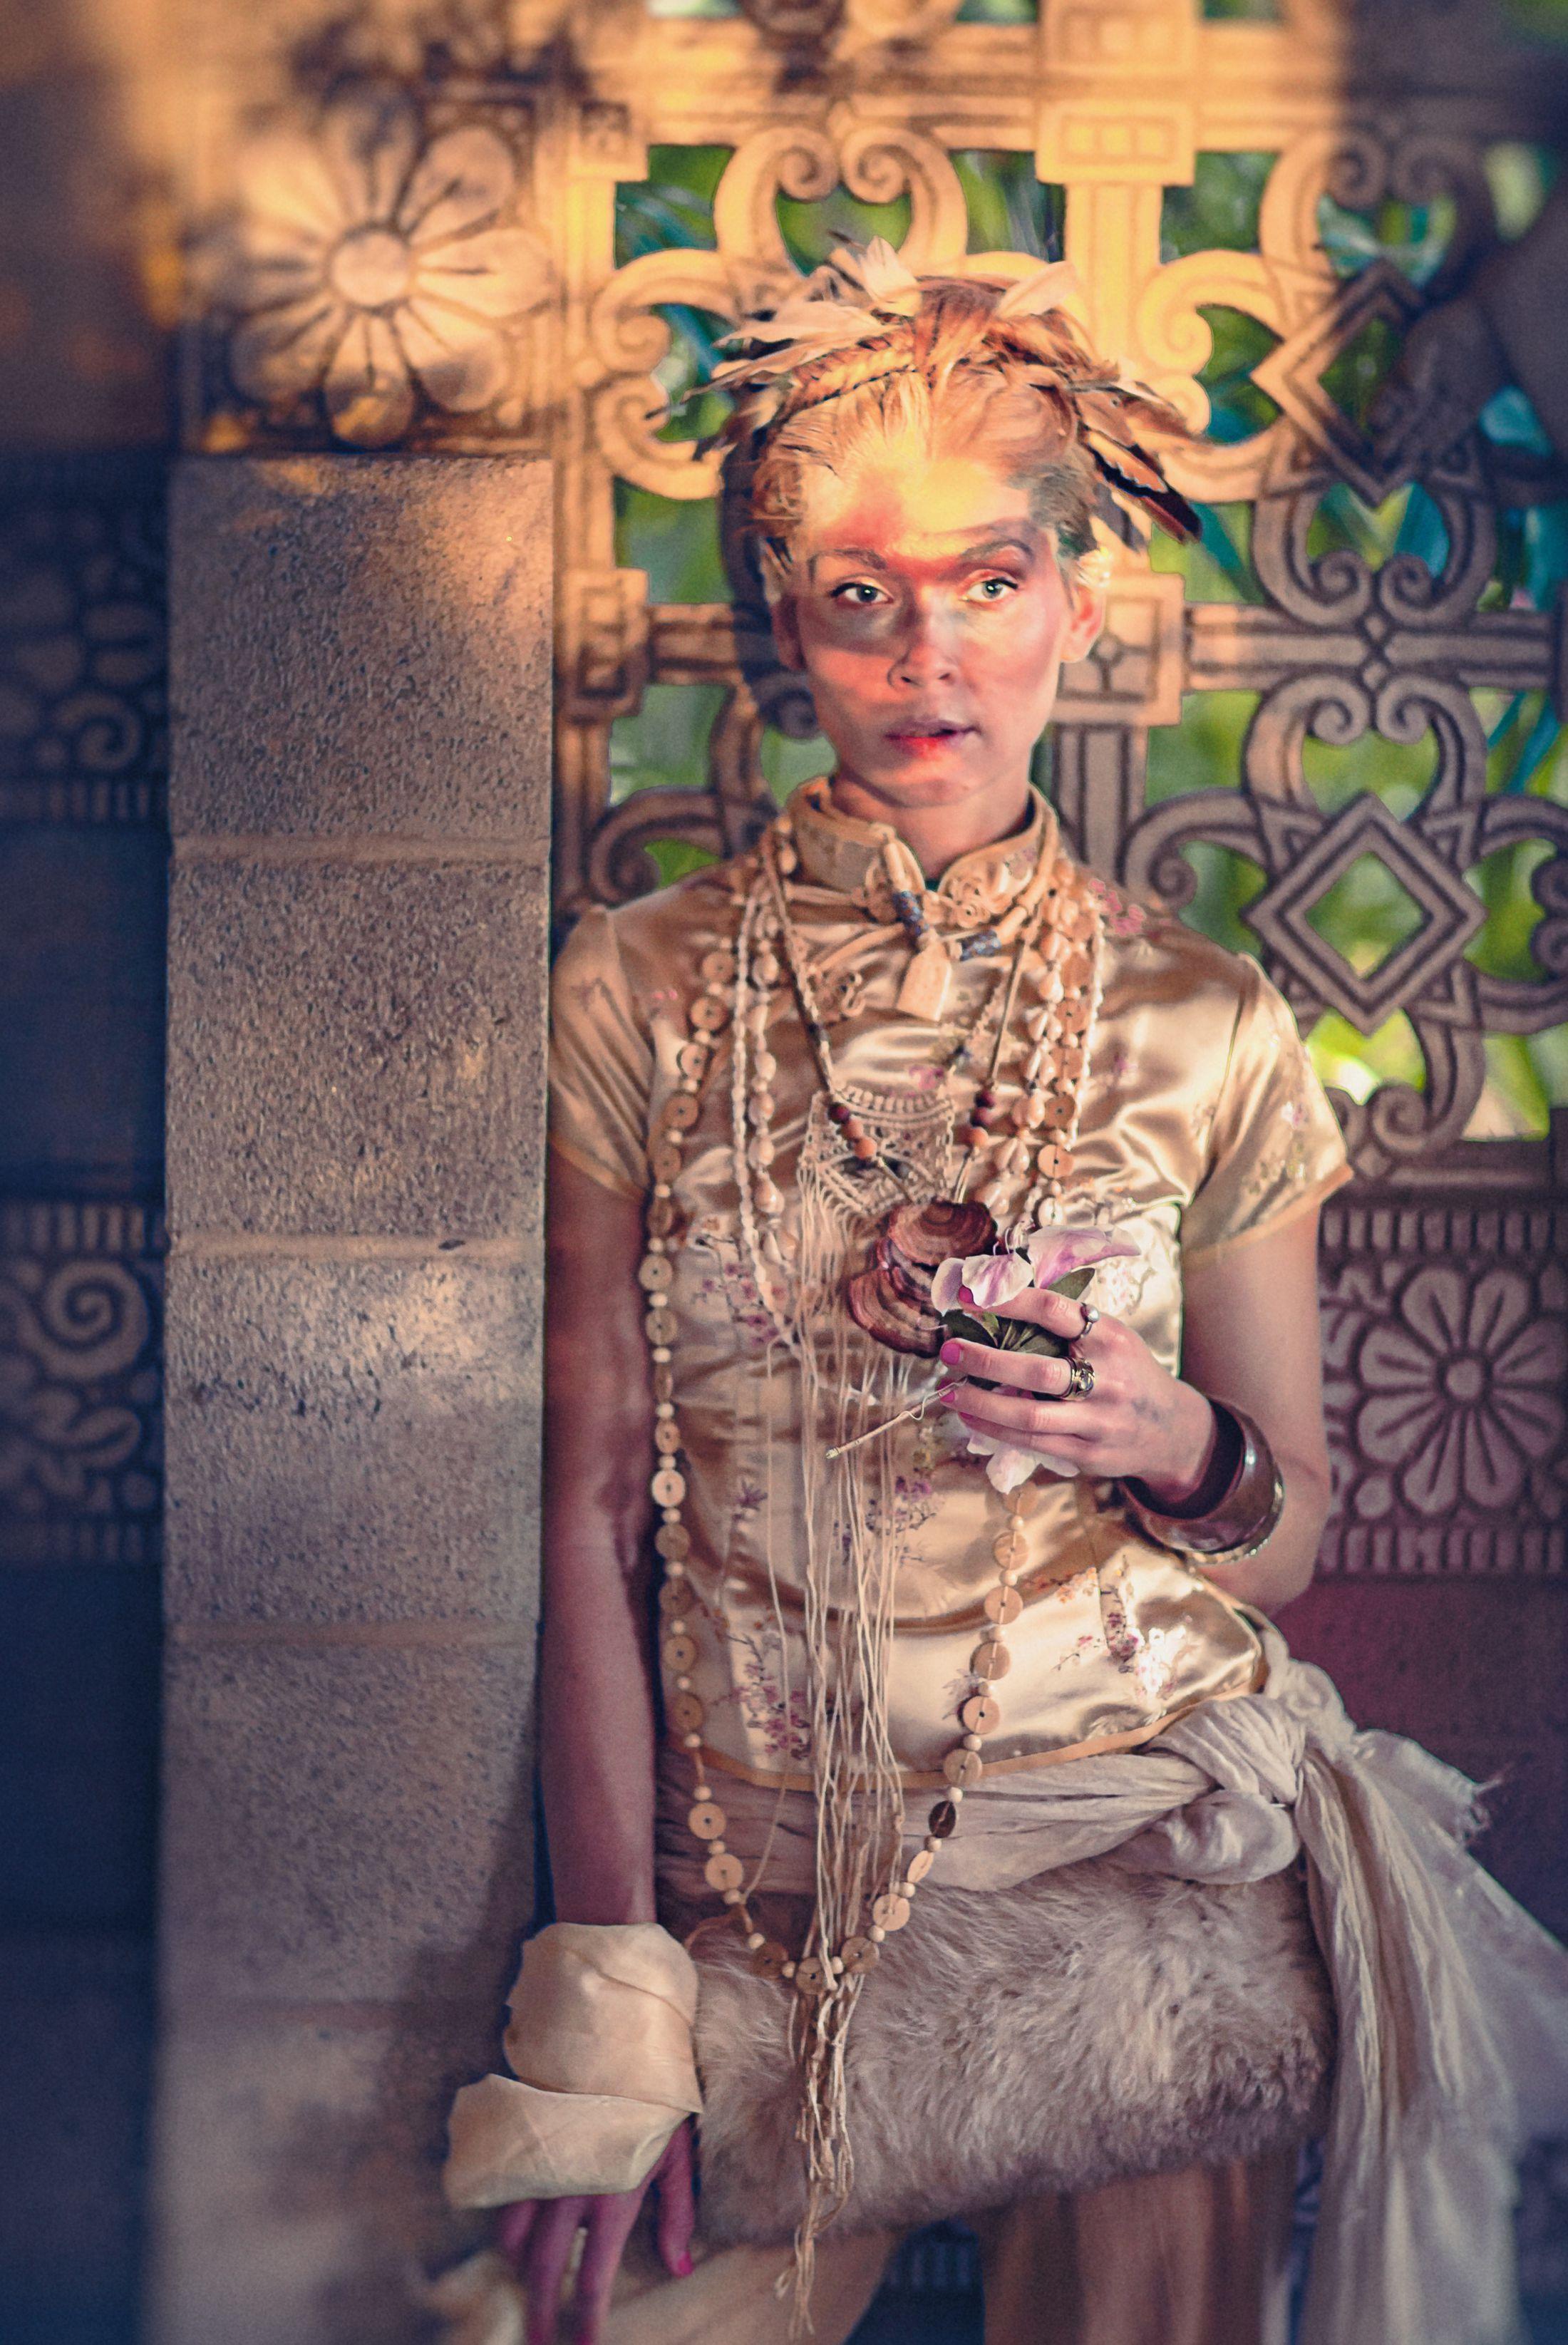 Electric Forest yoga LED light nomad festival style ethnic global fashion shoot warpaint tribal 3.jpg